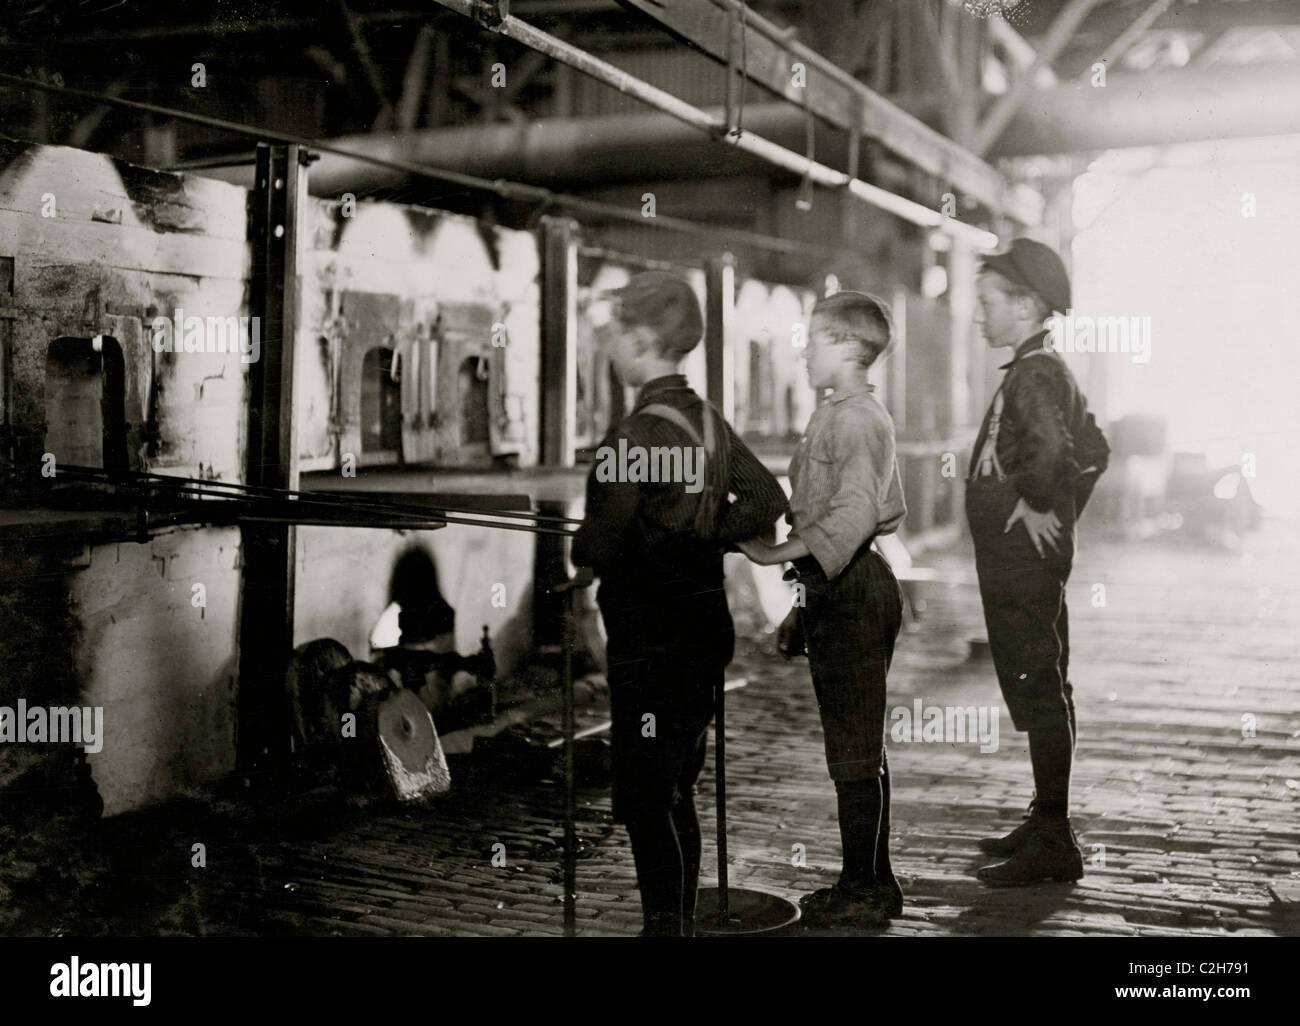 Boys at Lehr, Economy Glass Works - Stock Image